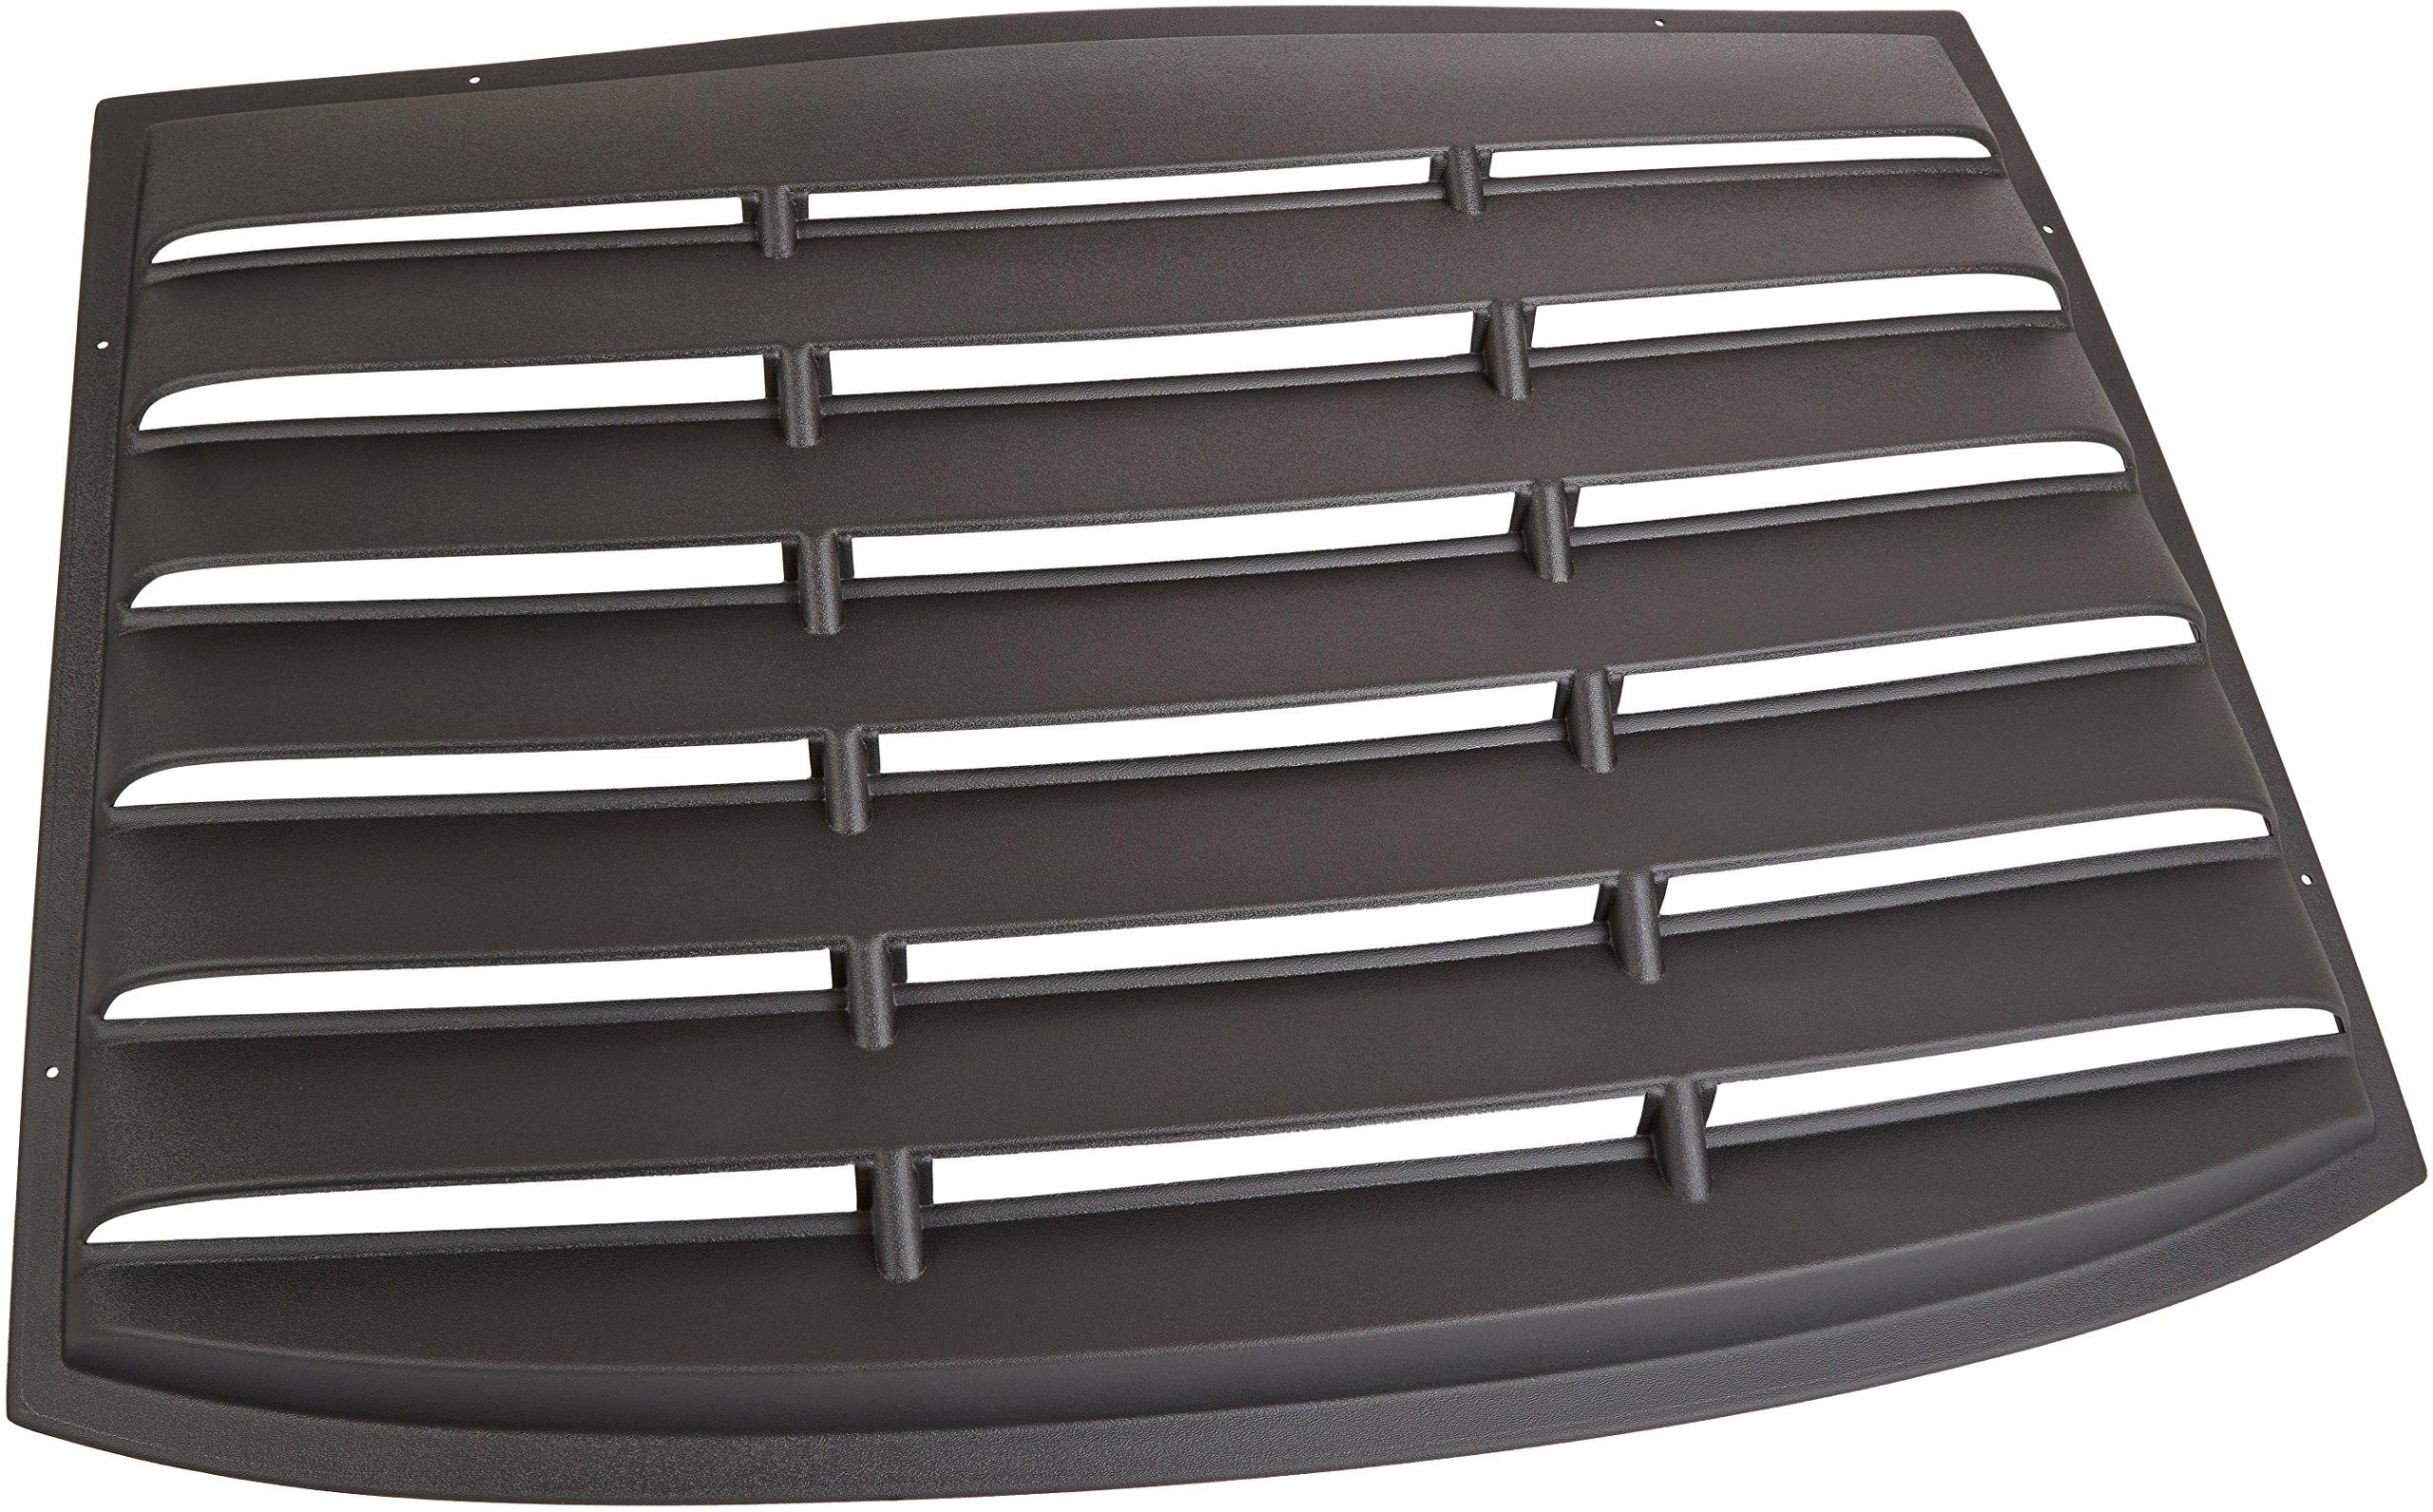 Willpak Industries 1557 ABS Car Louver for Chrysler/Dodge